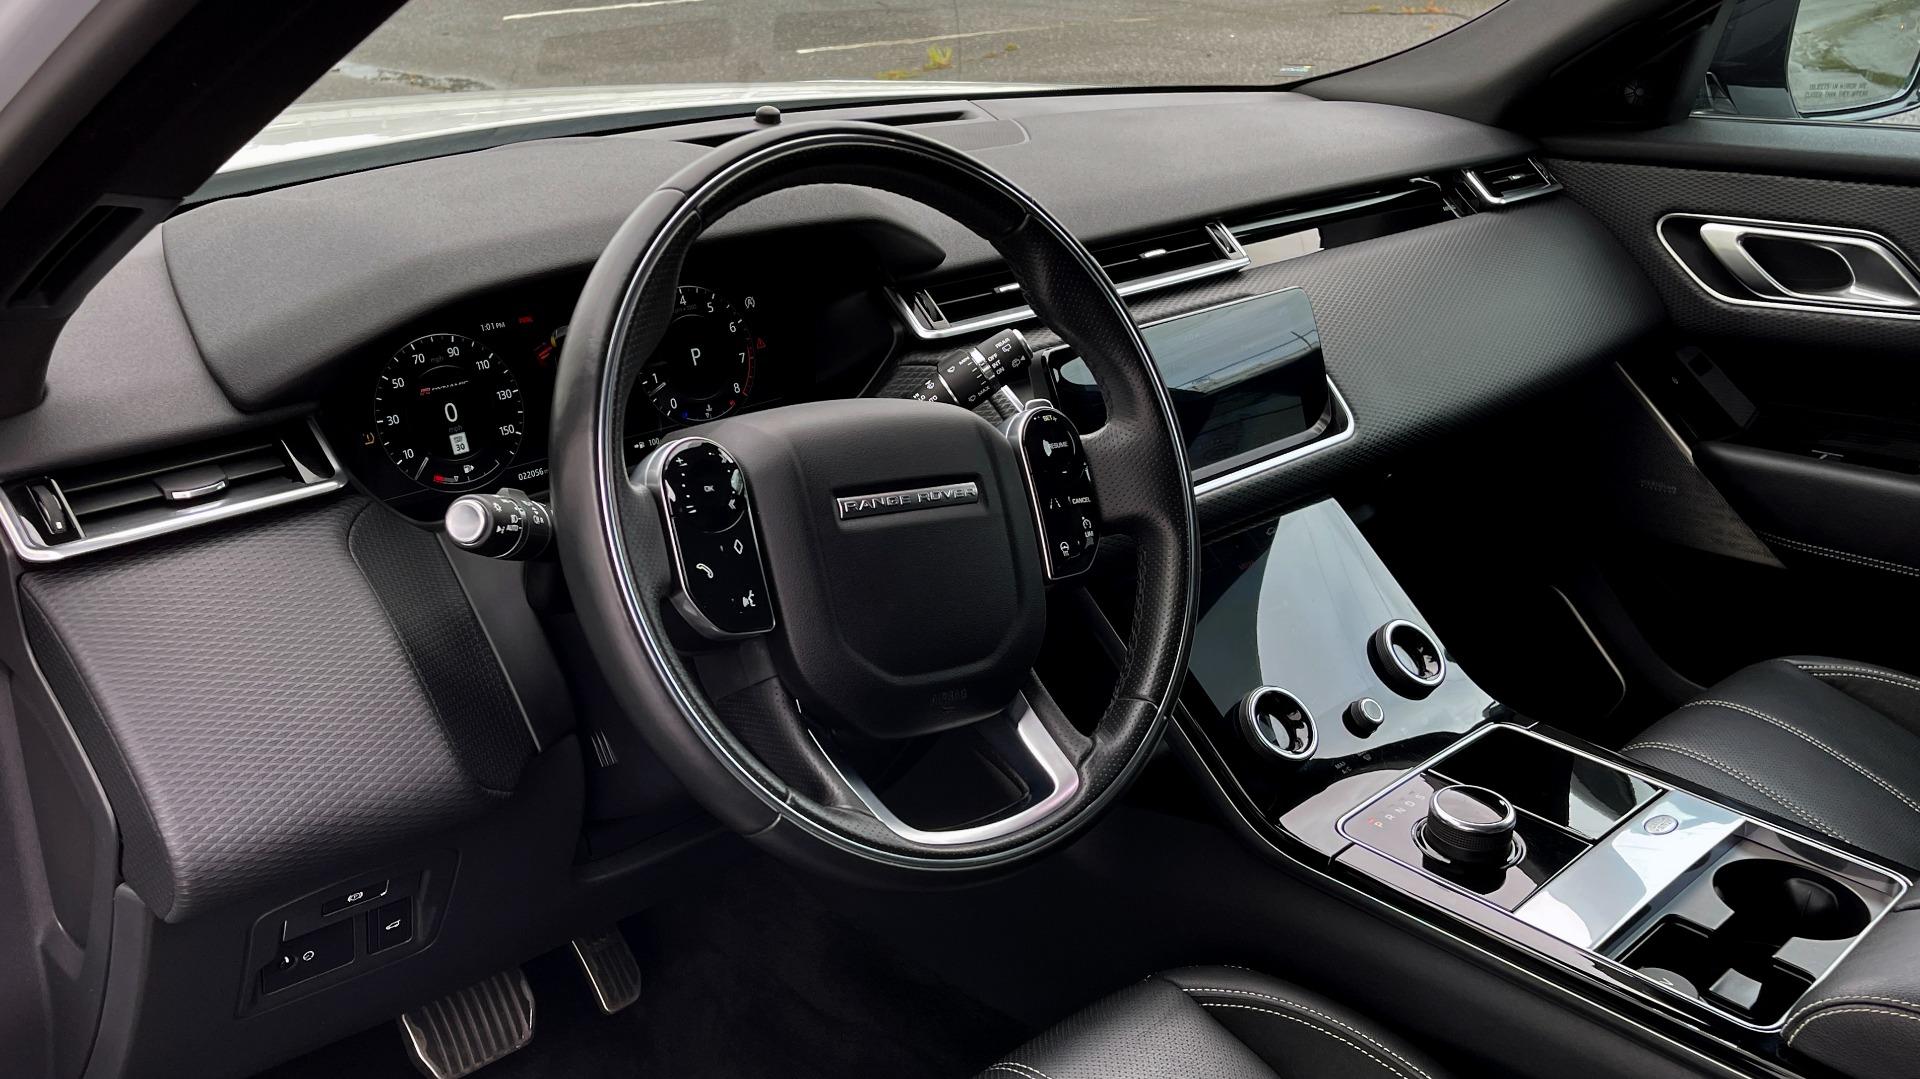 Used 2018 Land Rover RANGE ROVER VELAR R-DYNAMIC SE / NAV / PREM / MERIDIAN / SUNROOF / REARVIEW for sale $54,995 at Formula Imports in Charlotte NC 28227 27